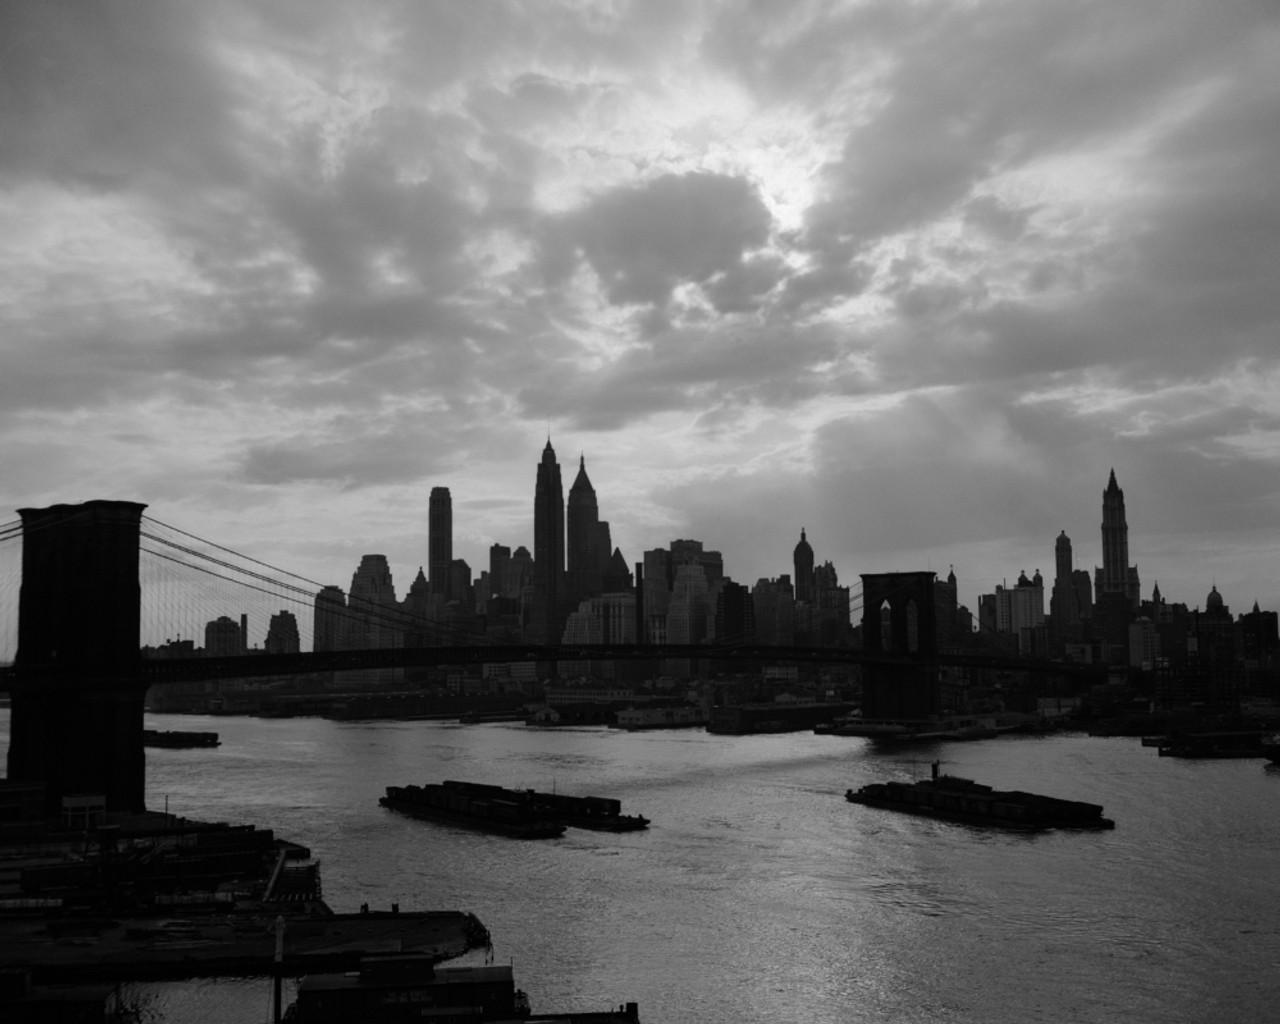 Brooklyn Bridge Black And White Background Wallpaper 23386 Baltana